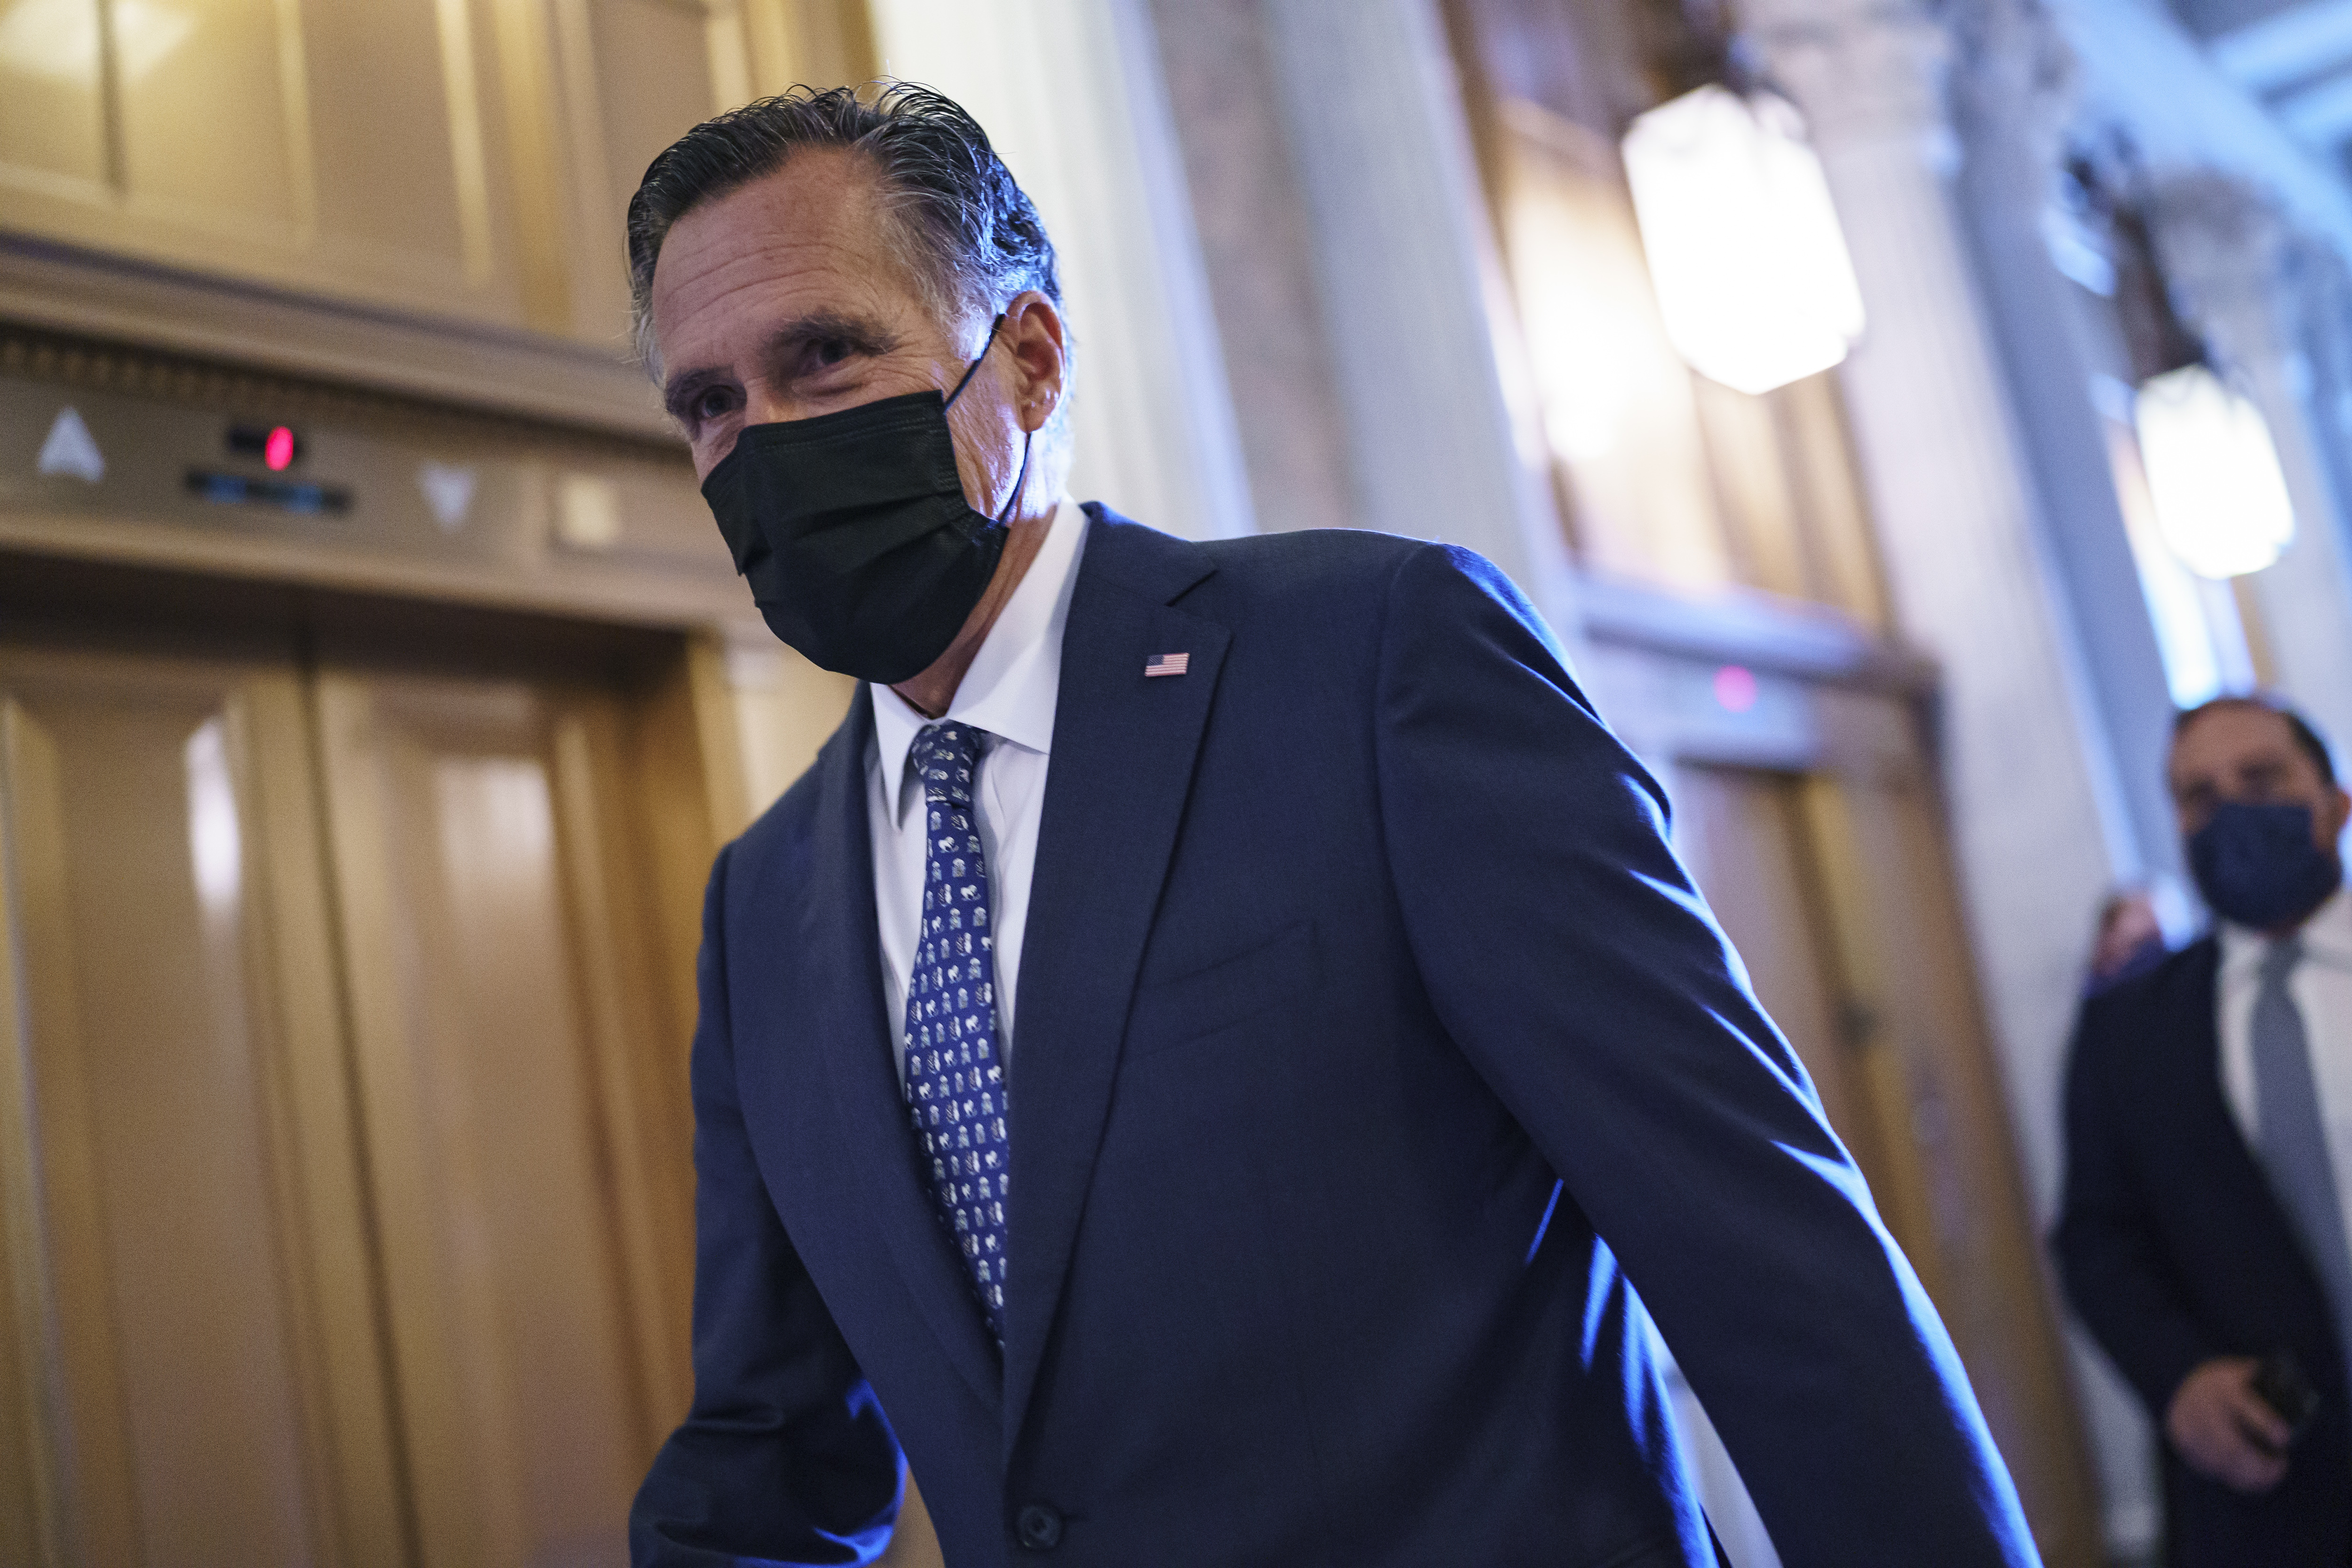 Utah Senator Mitt Romney arrives for a negotiating session over infrastructure.